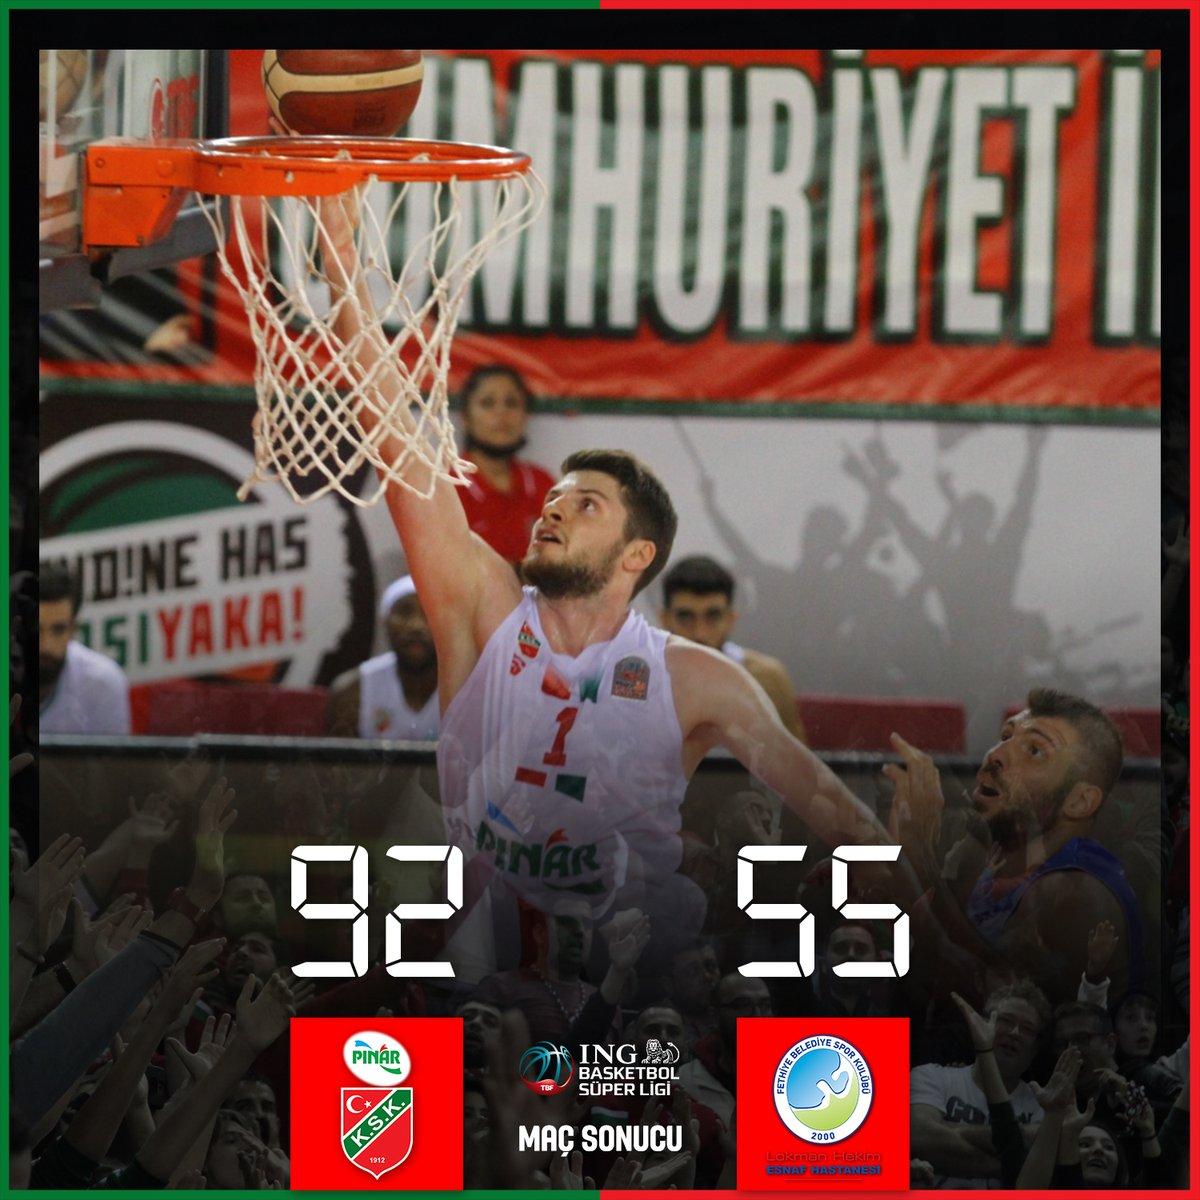 ✅ ING Basketbol Süper Ligi'nde yeni sezona 92-55'lik Lokman Hekim Fethiye Belediyespor galibiyetiyle başlıyoruz! 💪 https://t.co/3rUxQqhQhd